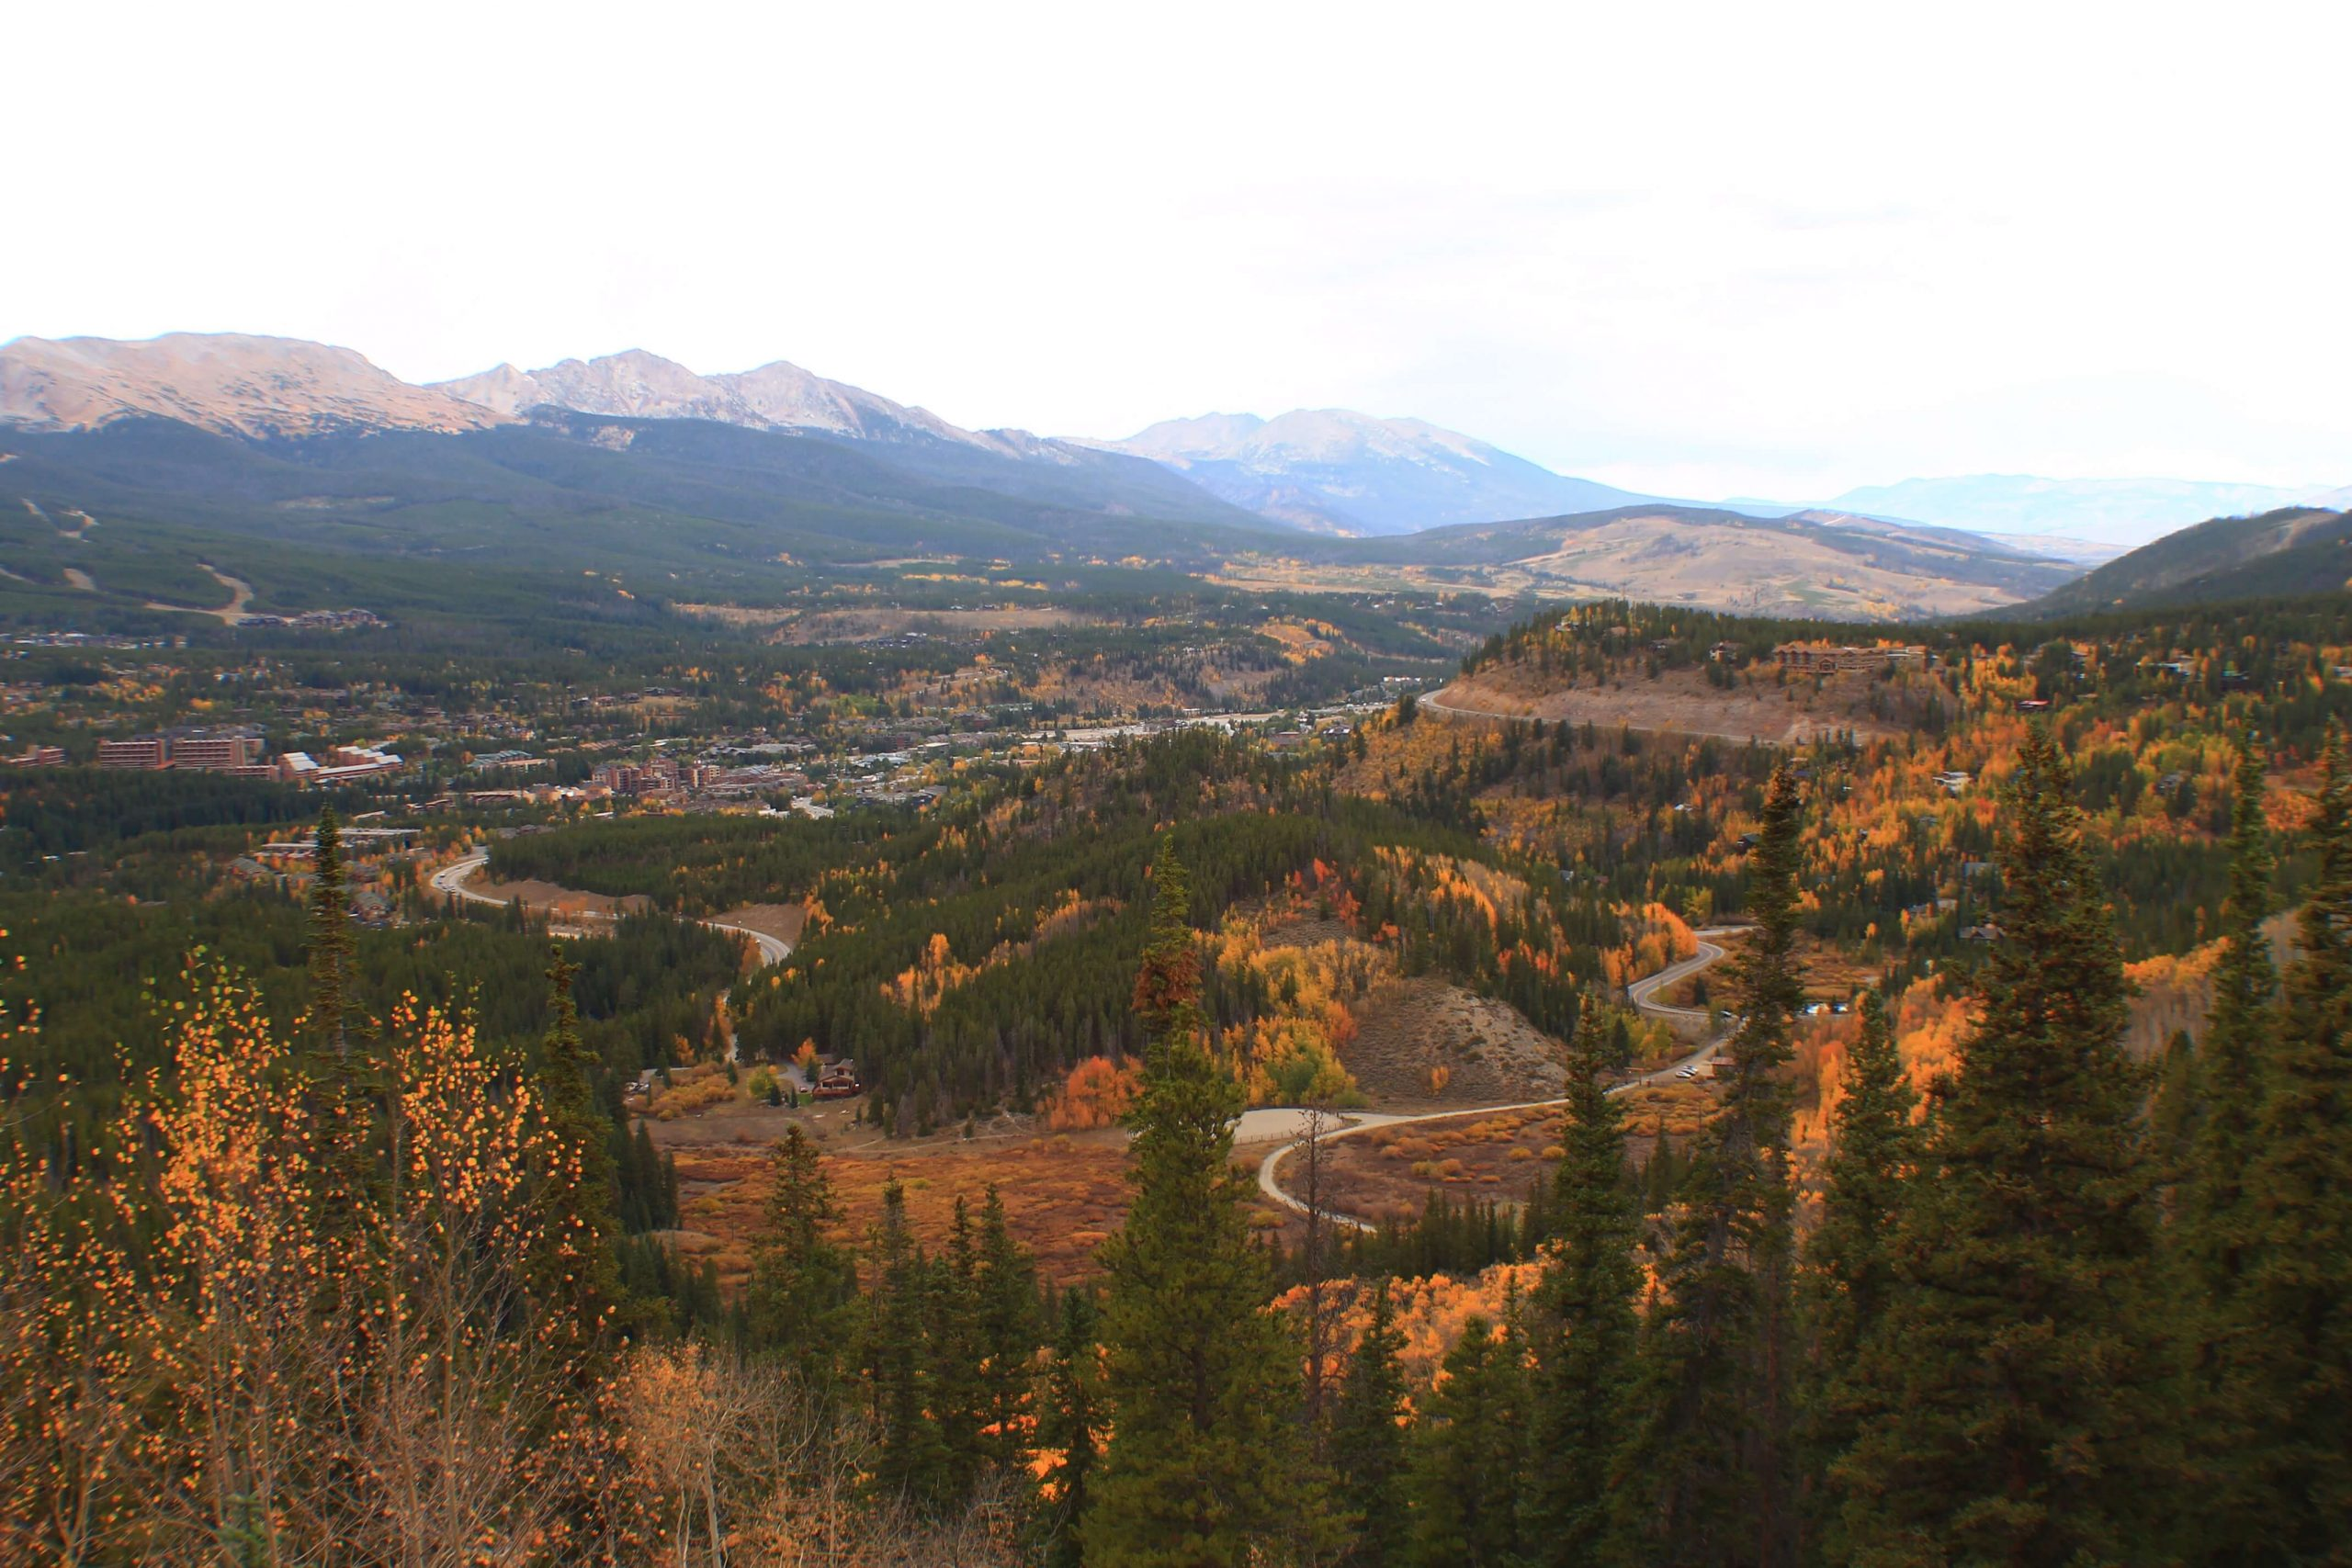 Boreas Pass and Bakers Tank, Best Mountain Biking in Breckenridge